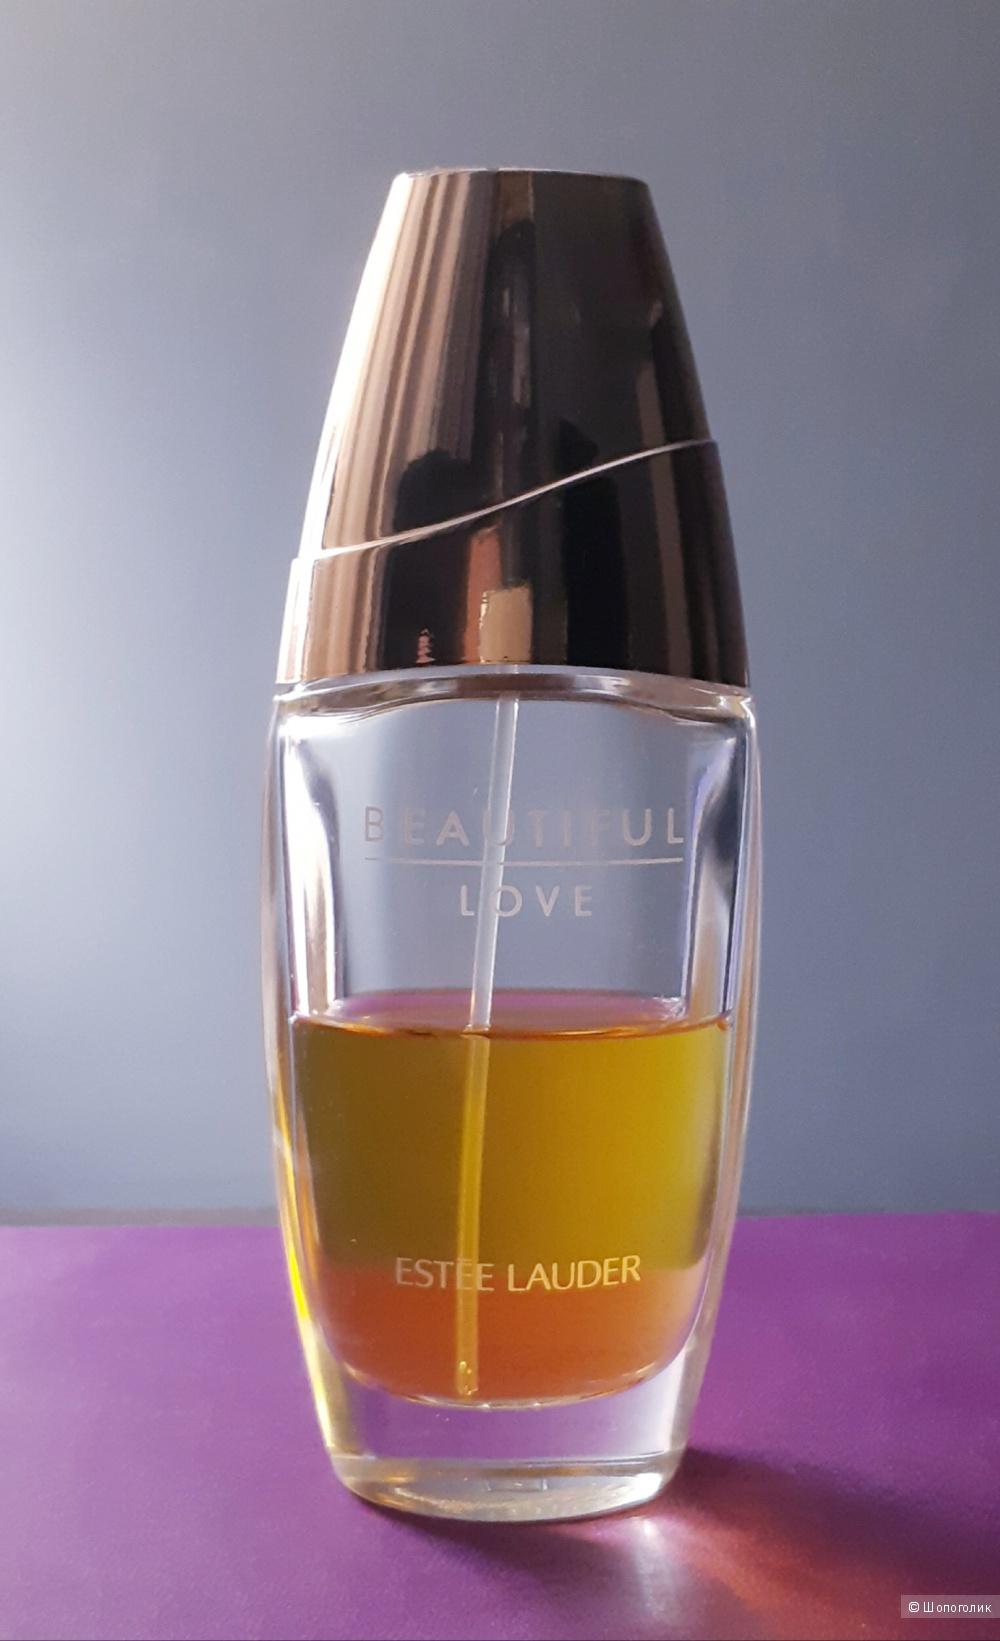 Estee Lauder Beautiful Loveпарфюм 35 мл